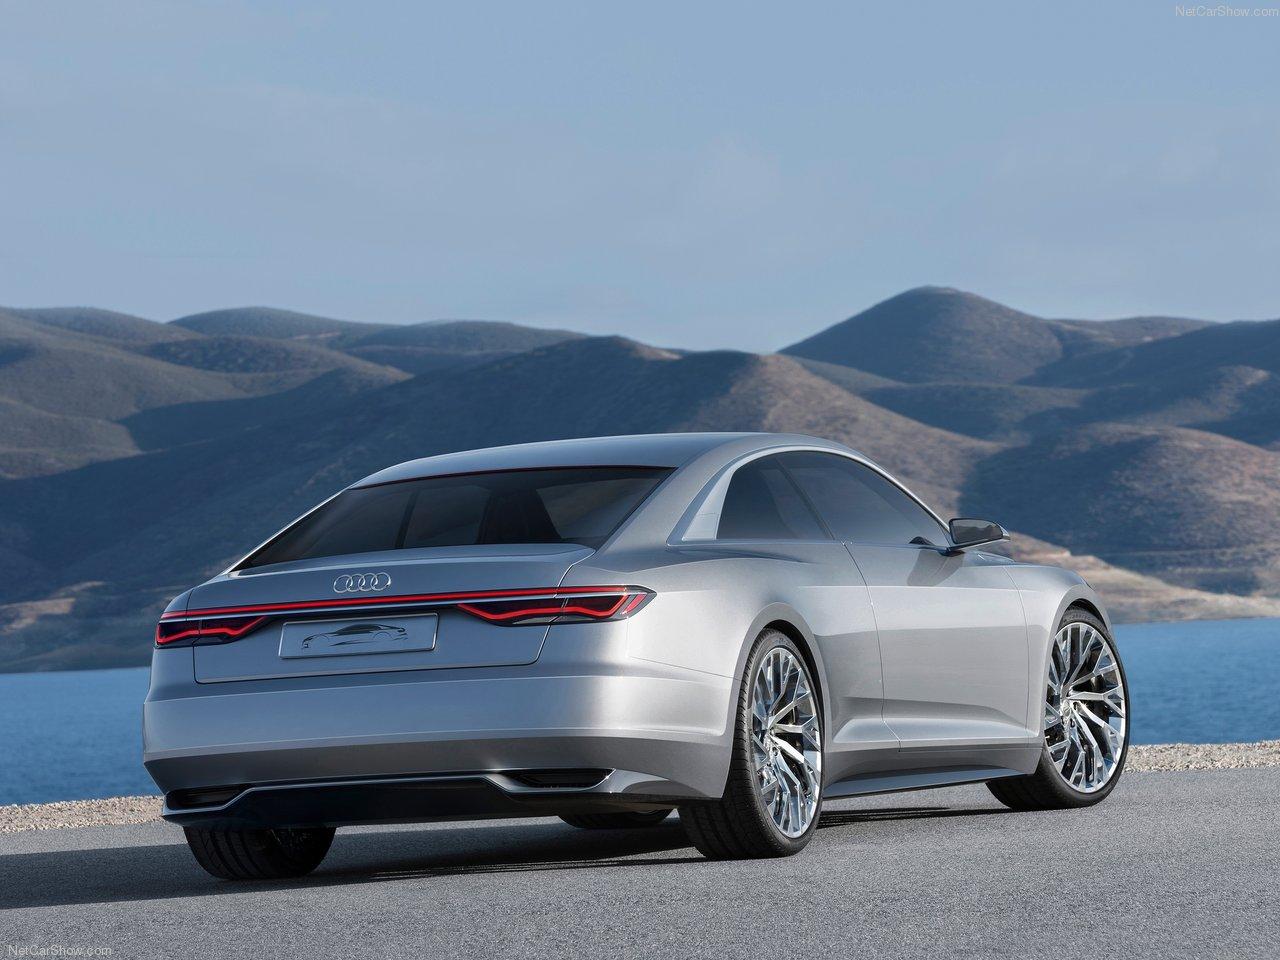 modelado 3D, automoción, 3D, coche, diseño de coches, diseño gráfico, AUDI PROLOGUE, audi, LA, Angeles, show car, design, concept car, survendesign